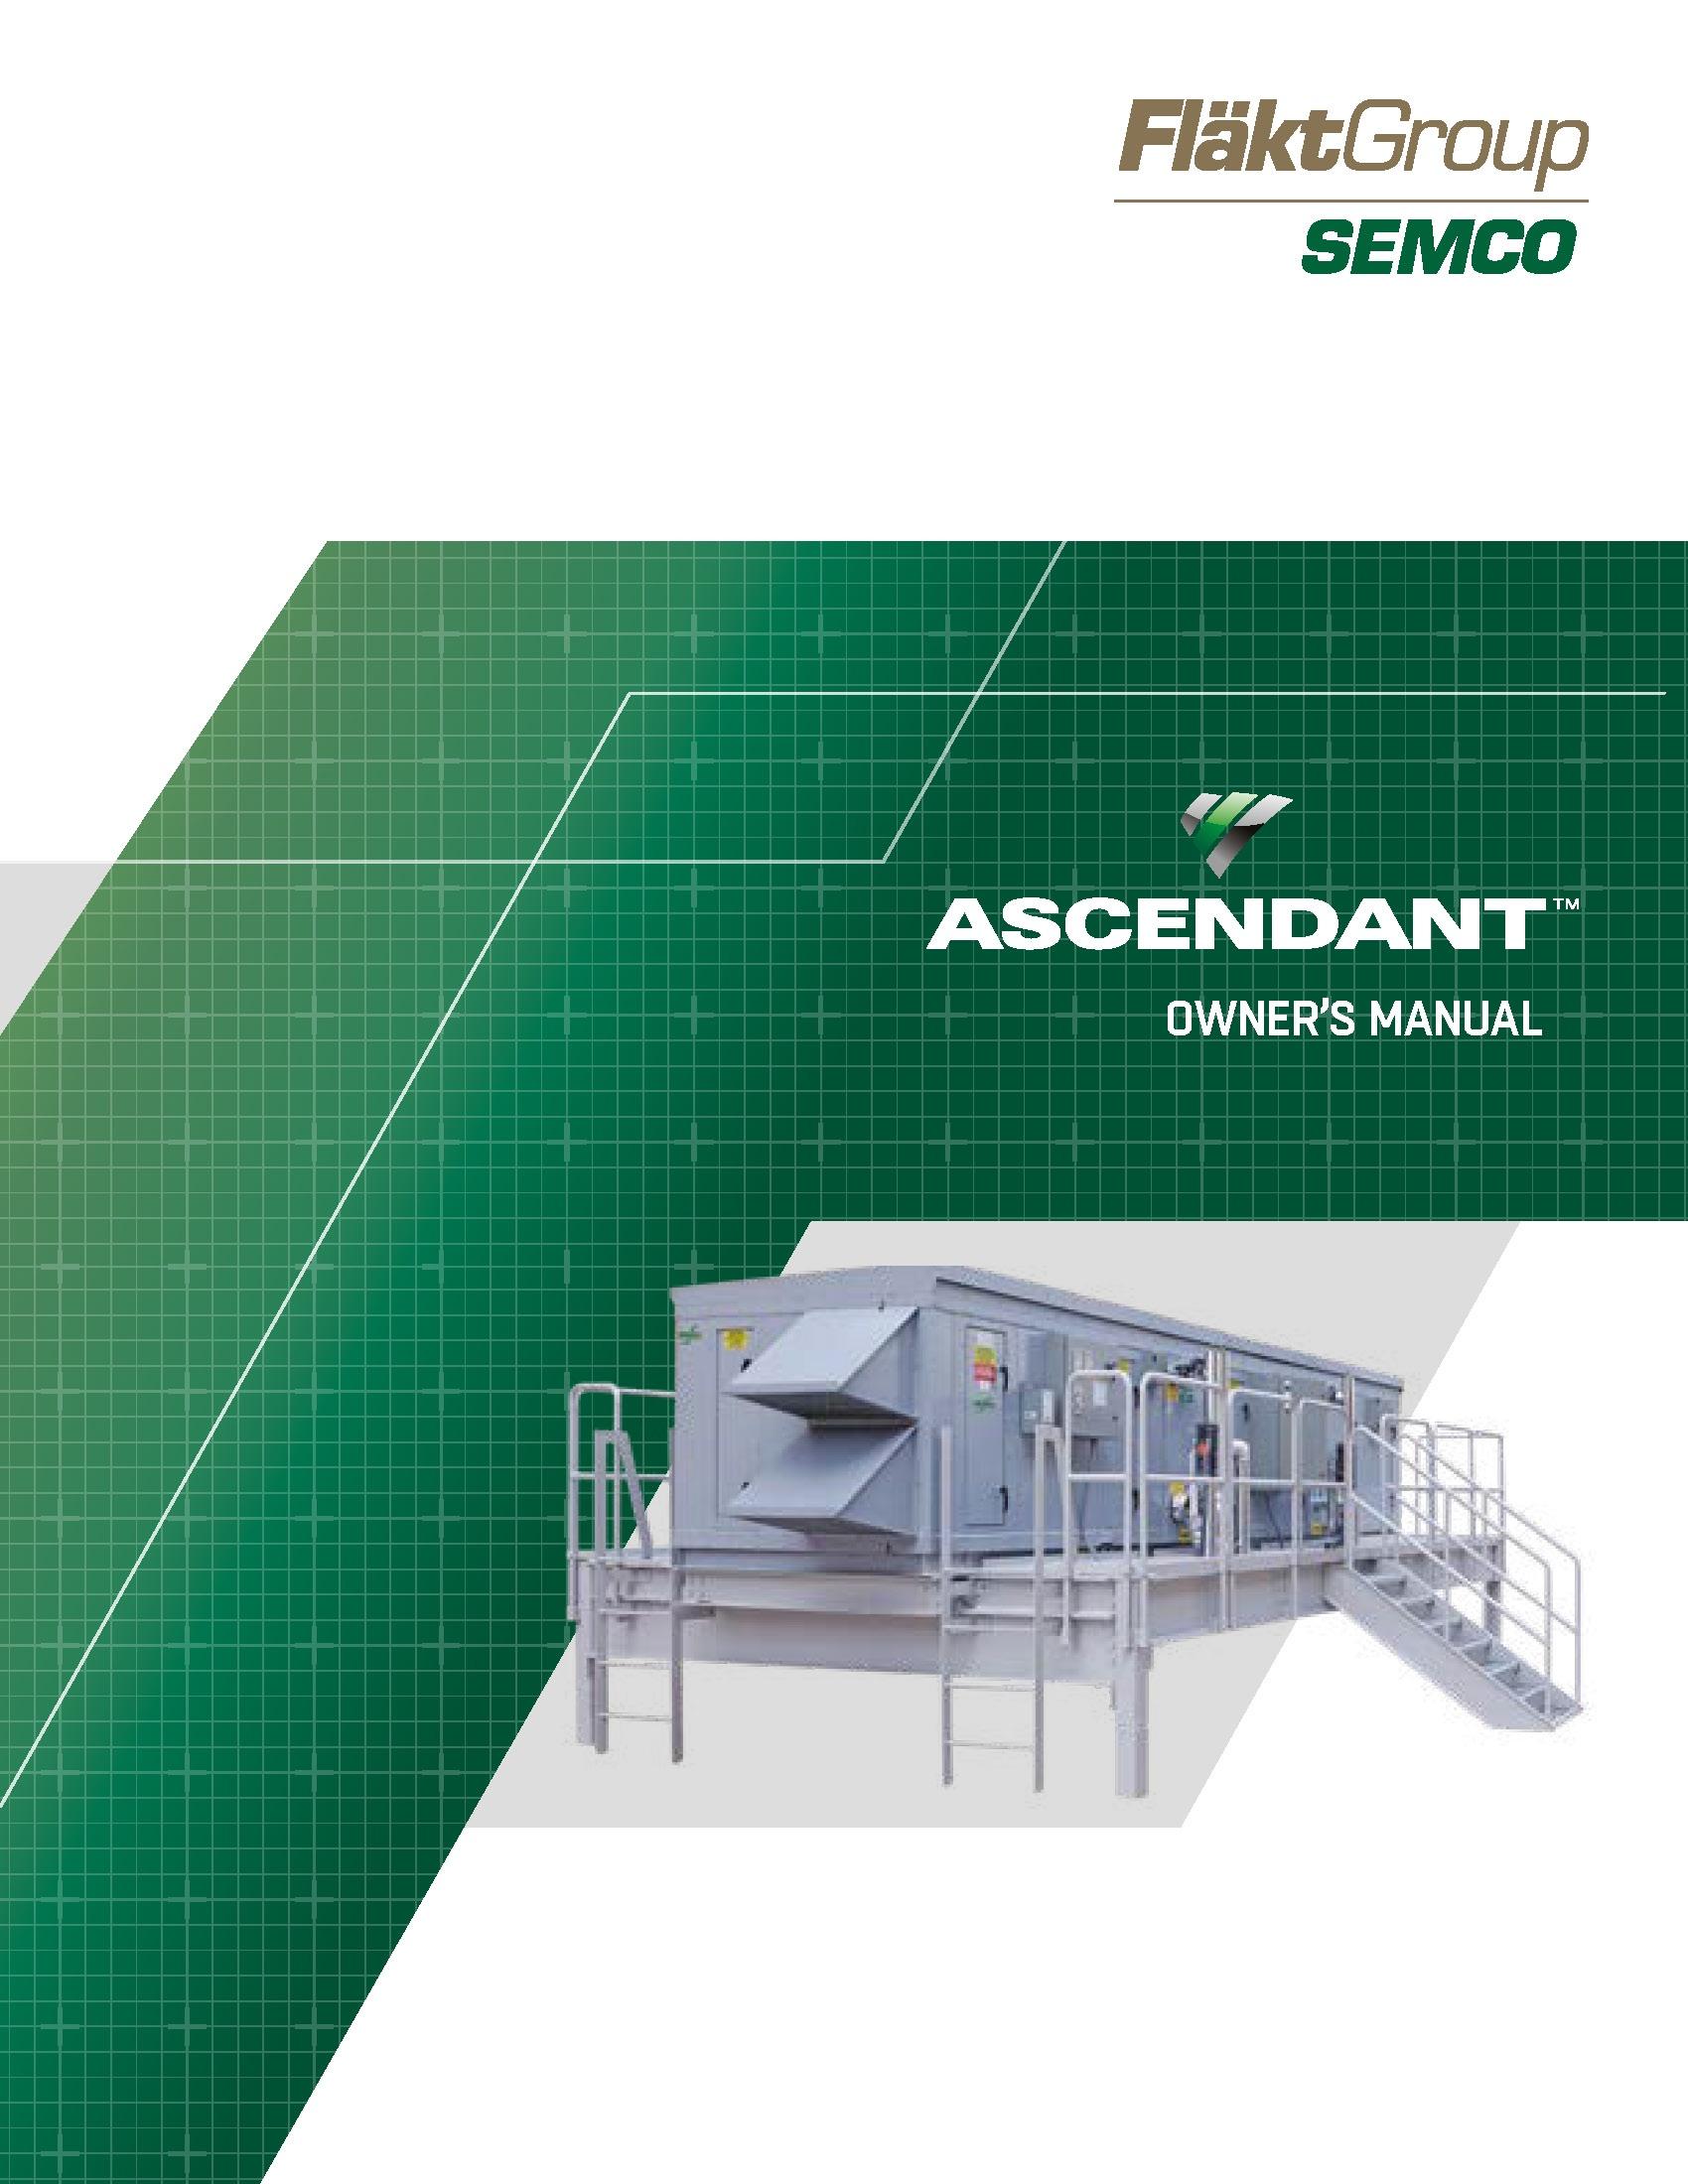 ASCENDANT_Owners_Manual_-_SEMCO_2015-10.jpg